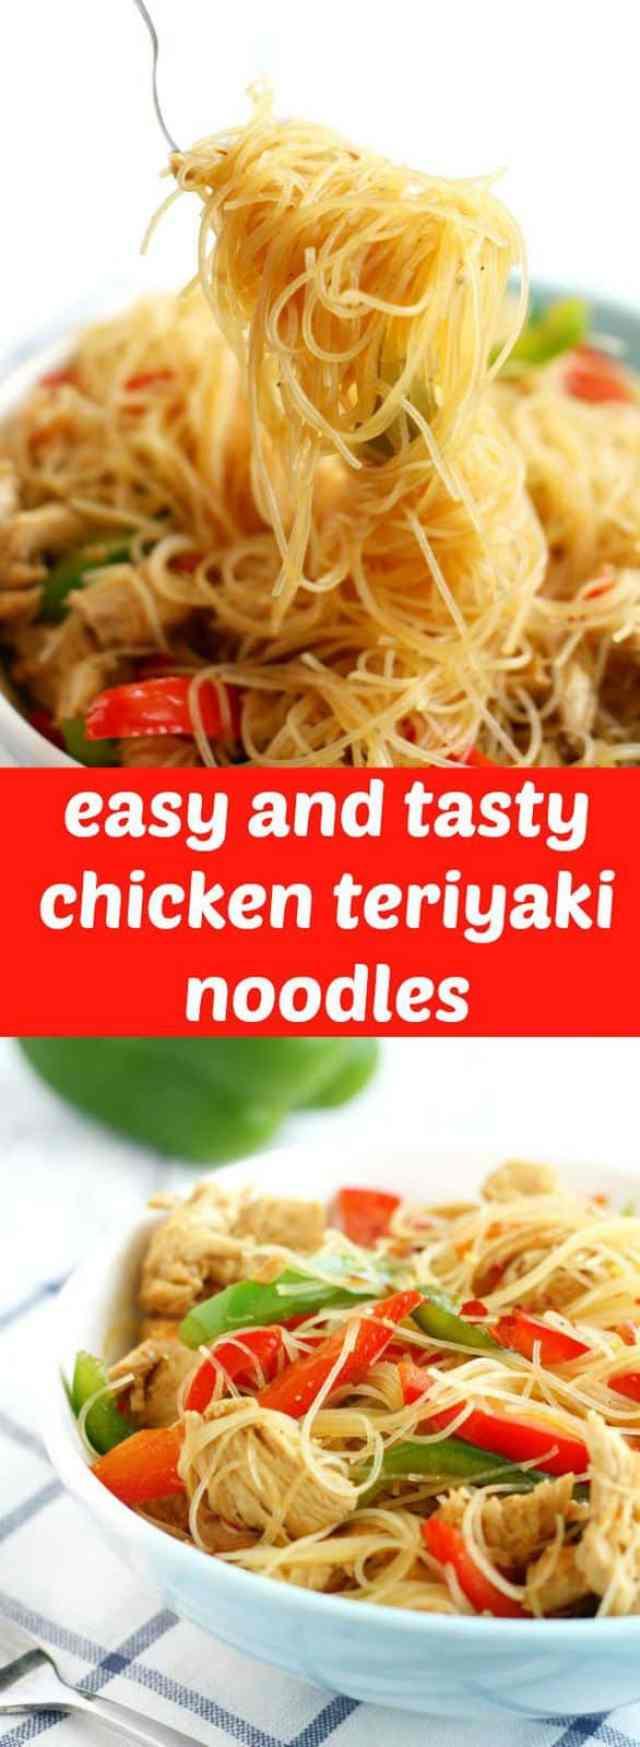 Easy and tasty chicken teriyaki noodles make a wonderfully fast week night dinner!